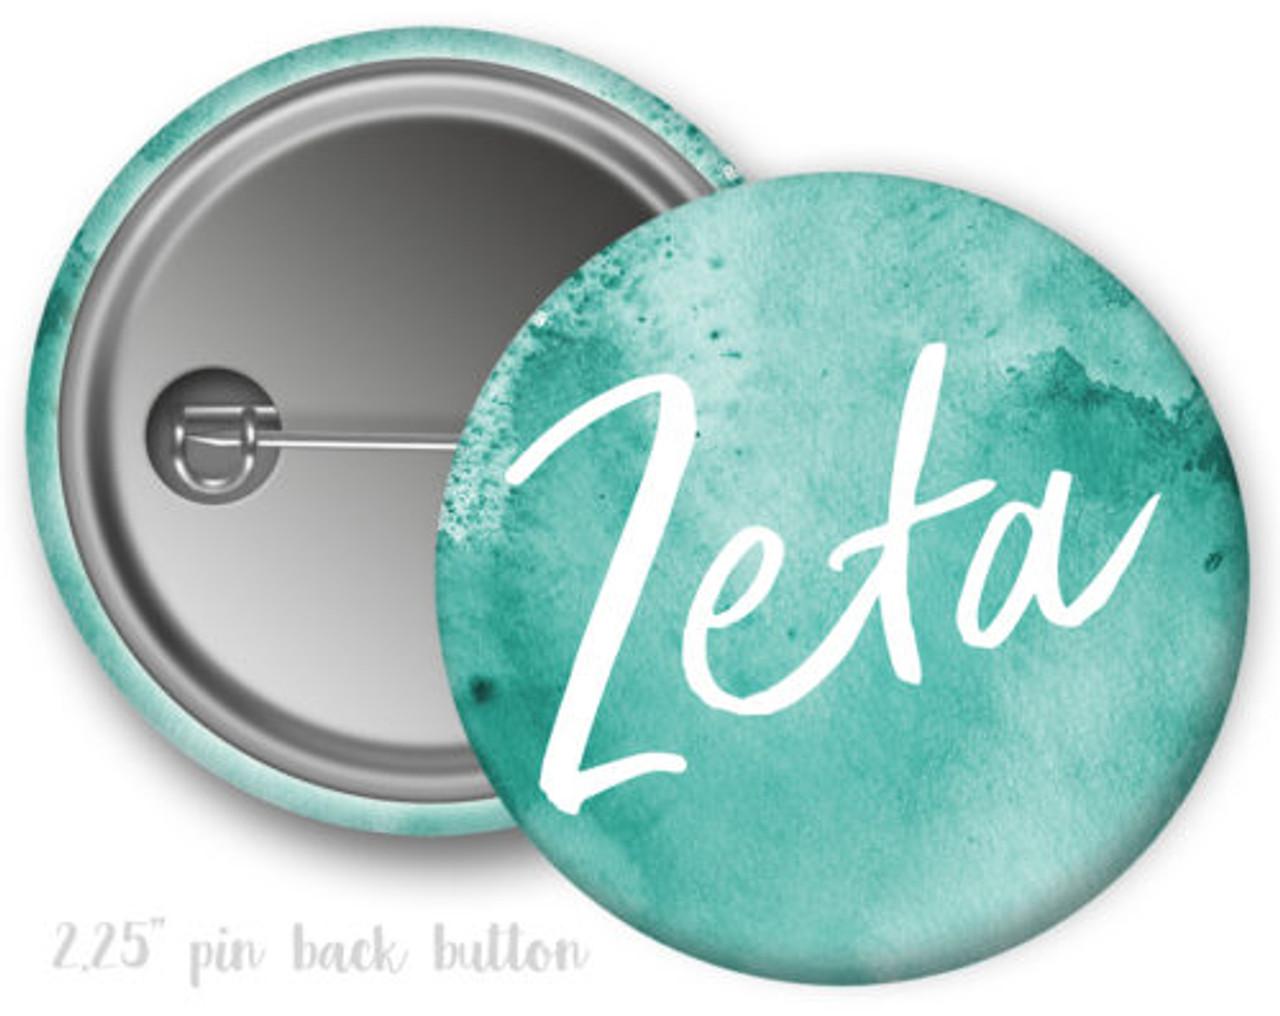 Zeta Tau Alpha Sorority Buttons